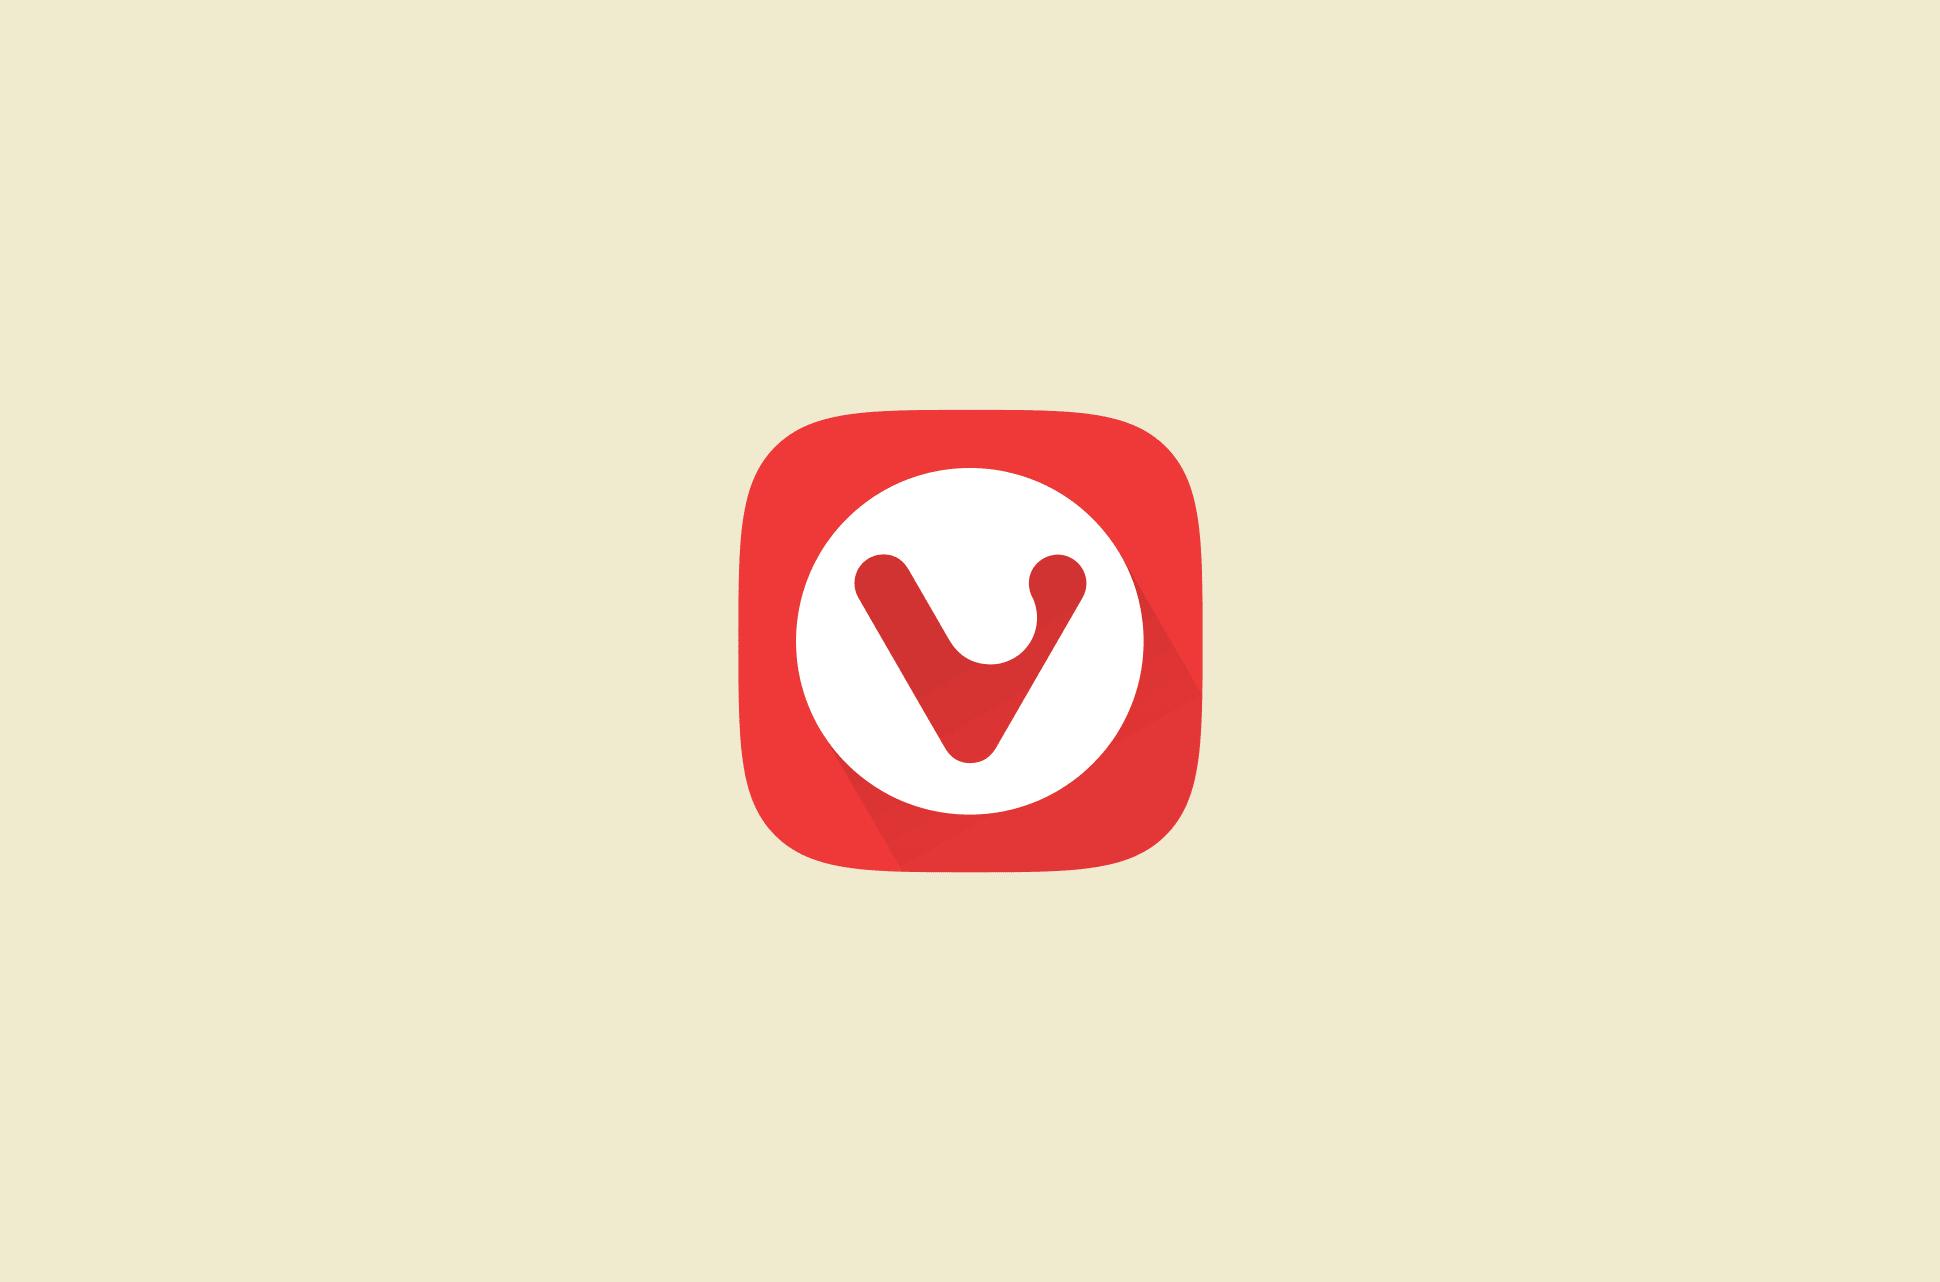 Vivaldi browser logo.